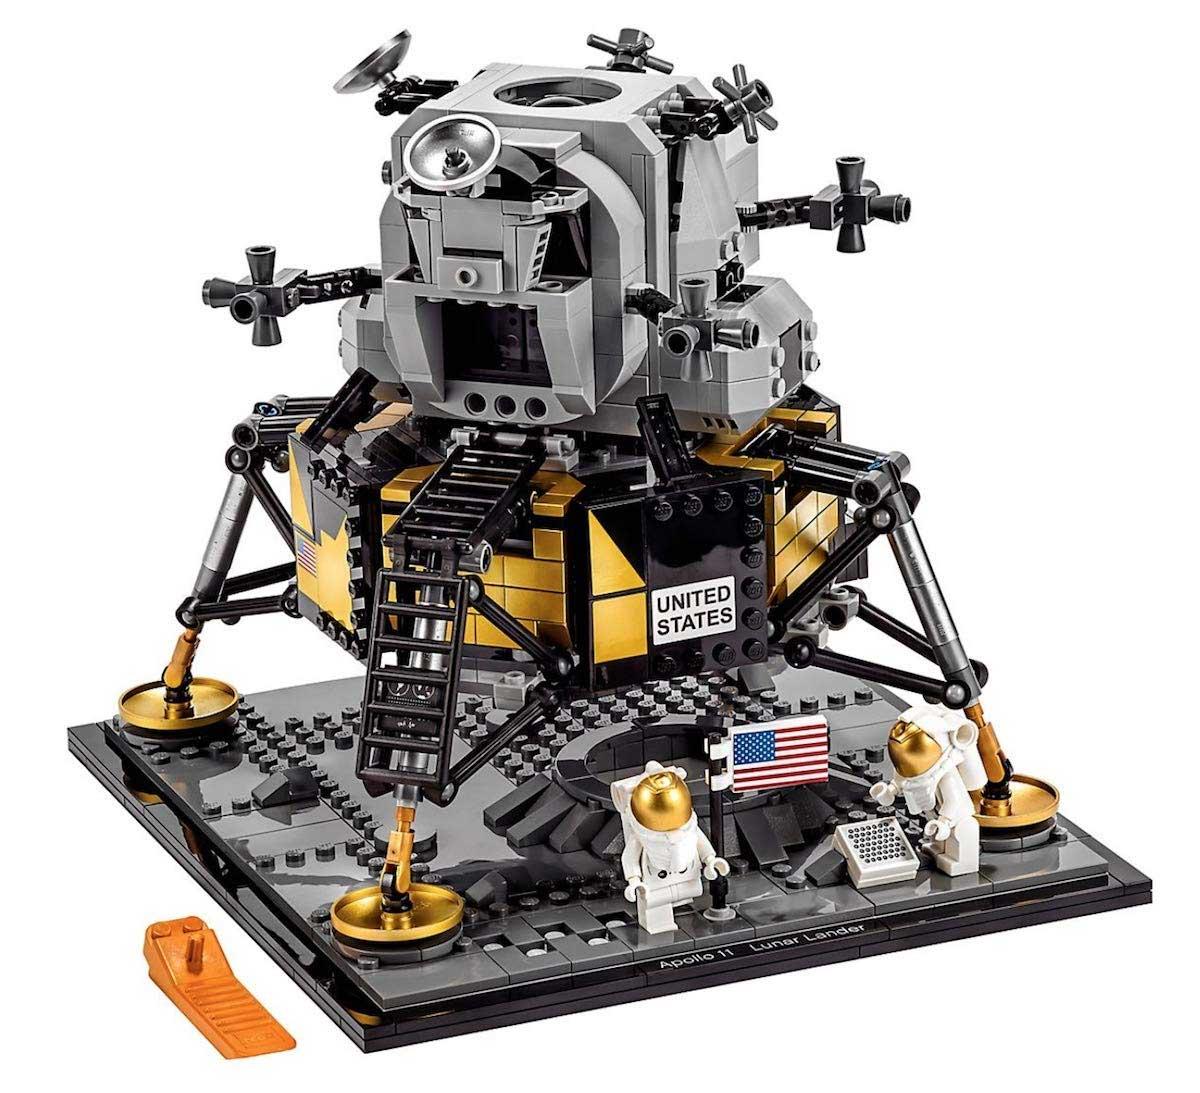 "LEGO feiert 50 Jahre Mondlandung mit dem Set ""NASA Apollo 11 Mondlandefähre"" LEGO-Mondlandung-set_06"